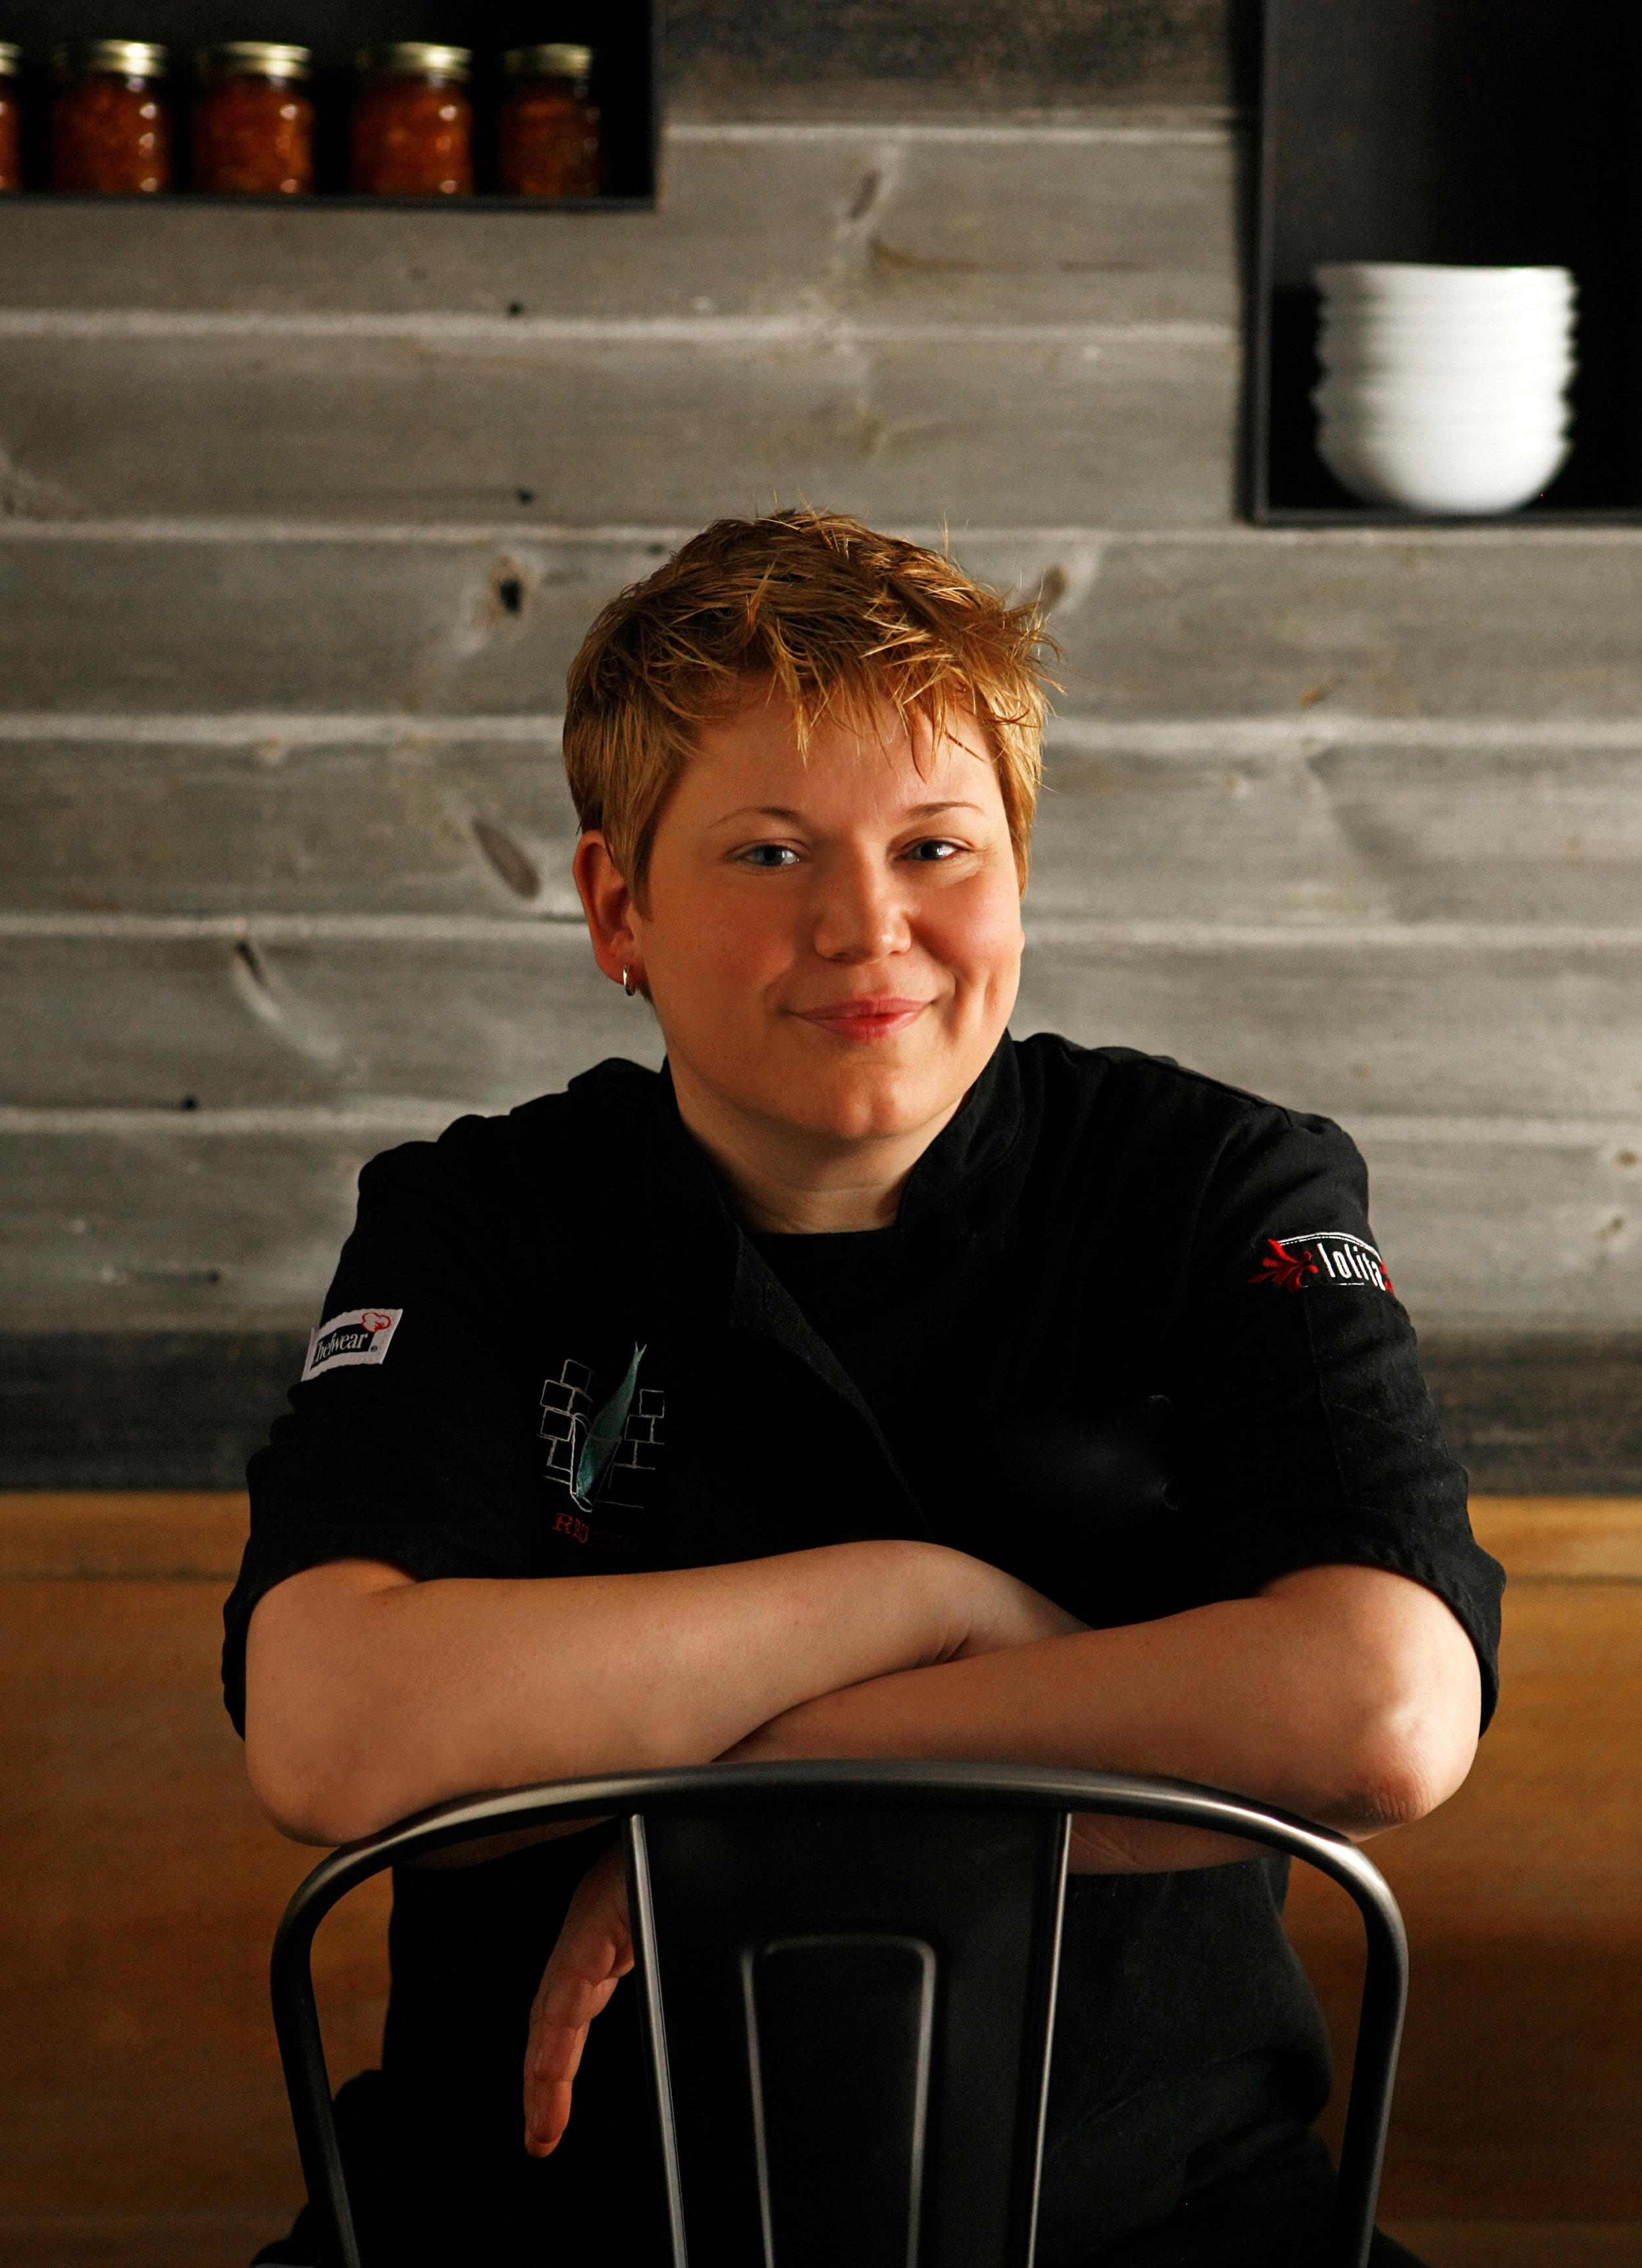 Chef Marcie Turney 2015 - Credit Jason Varney - HighRes.jpg